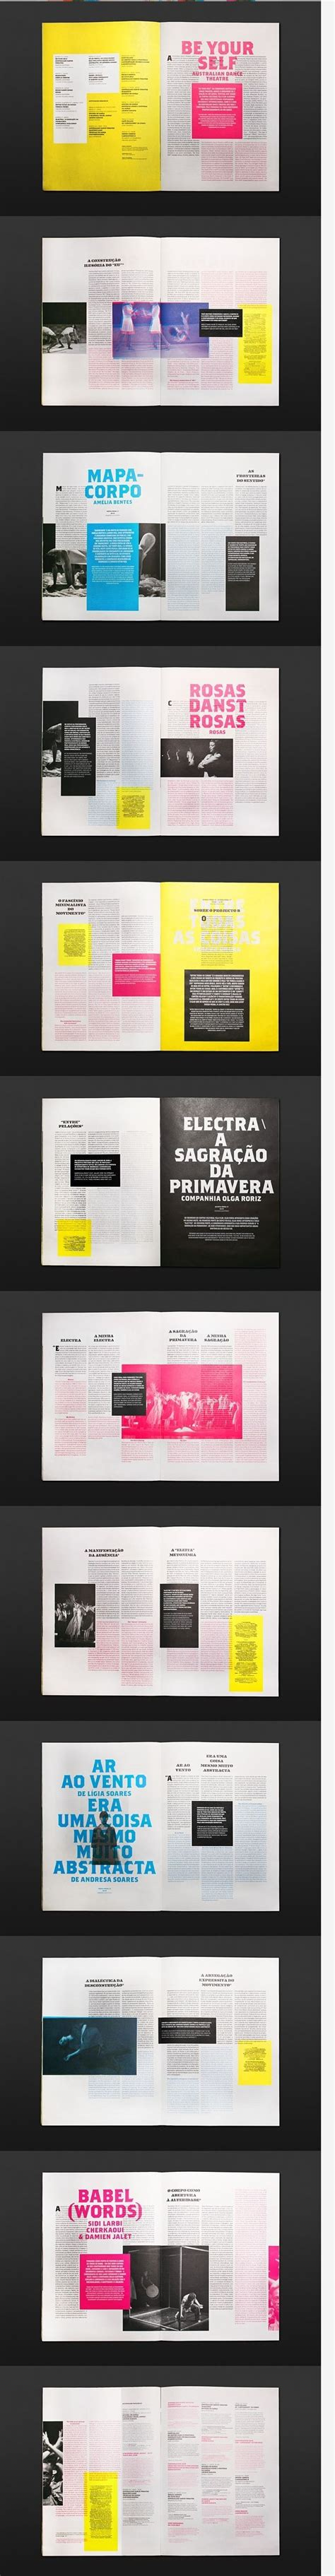 editorial design inspiration editorial design inspiration